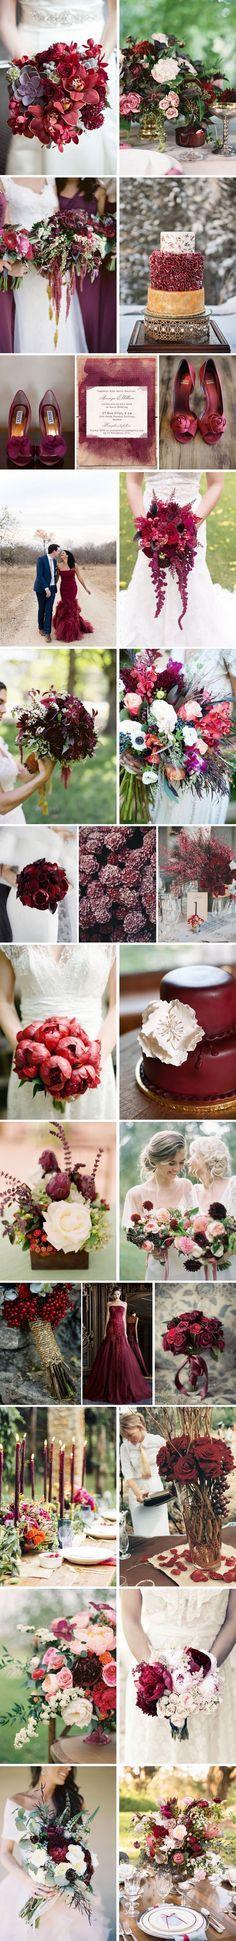 35 {Aubergine and Marsala} Classic Fall Wedding Color Ideas   http://www.deerpearlflowers.com/35-aubergine-marsala-classic-fall-wedding-color-ideas/